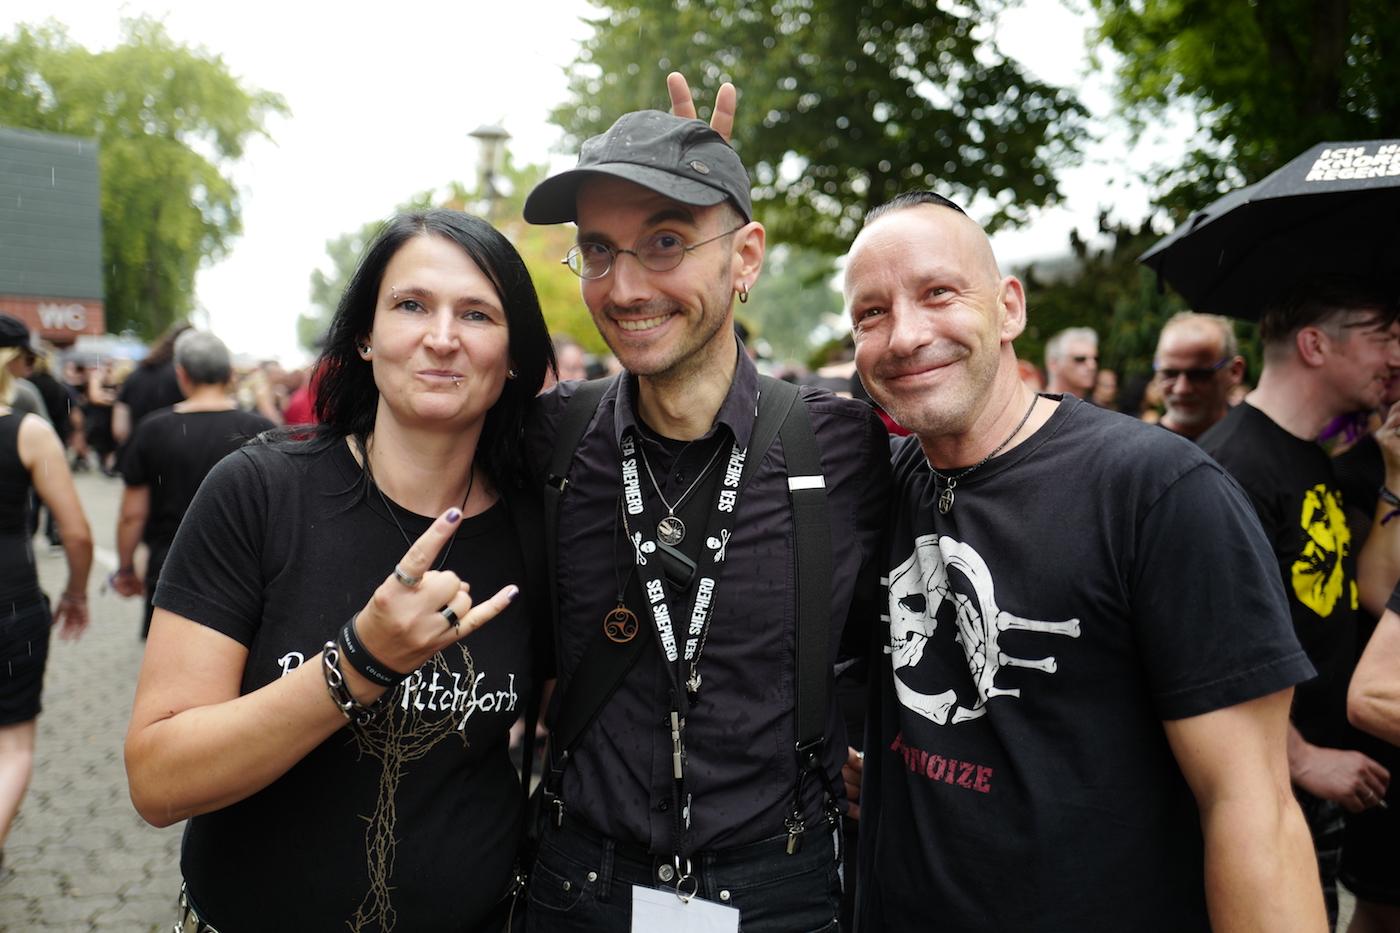 mark_benecke_amphi_festival_koeln_cologne_tanzbrunnen_gothic_OMD_oomph_agonoize_mono_inc_es23_sitd_solar_fake - 60.jpg